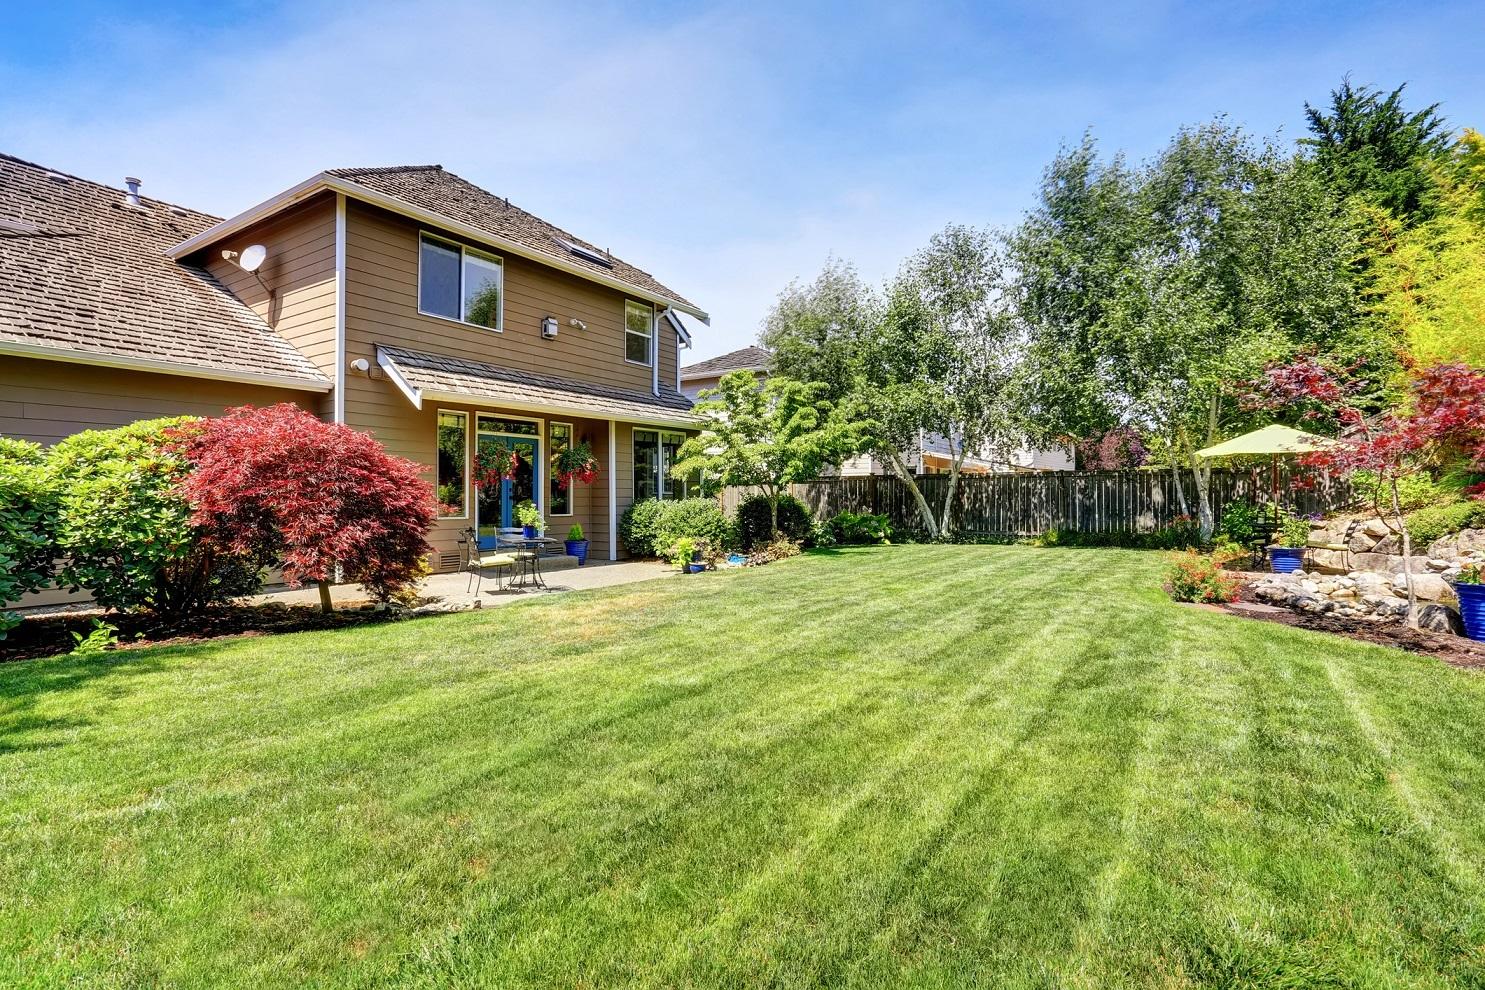 15 Things I Wish I Knew Before I Bought My House